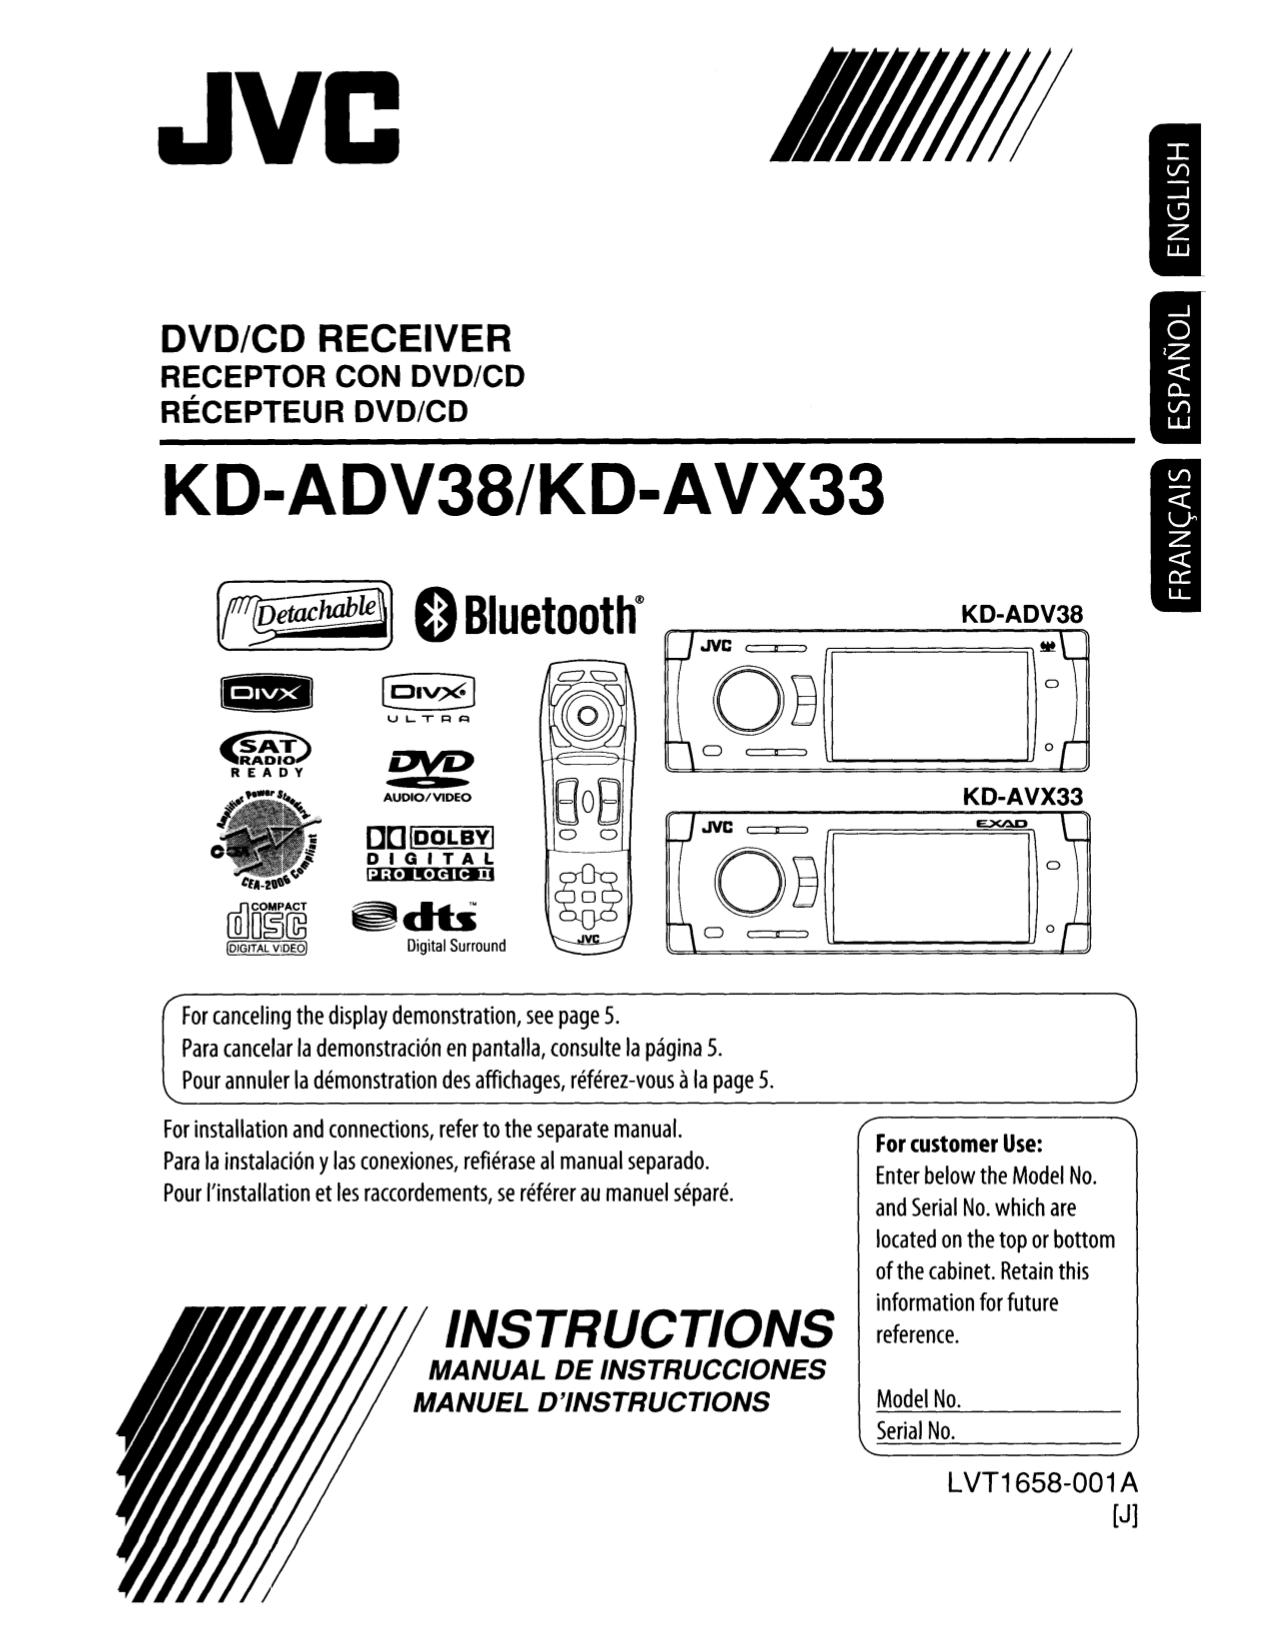 Инструкция Jvc Kd-Avx33